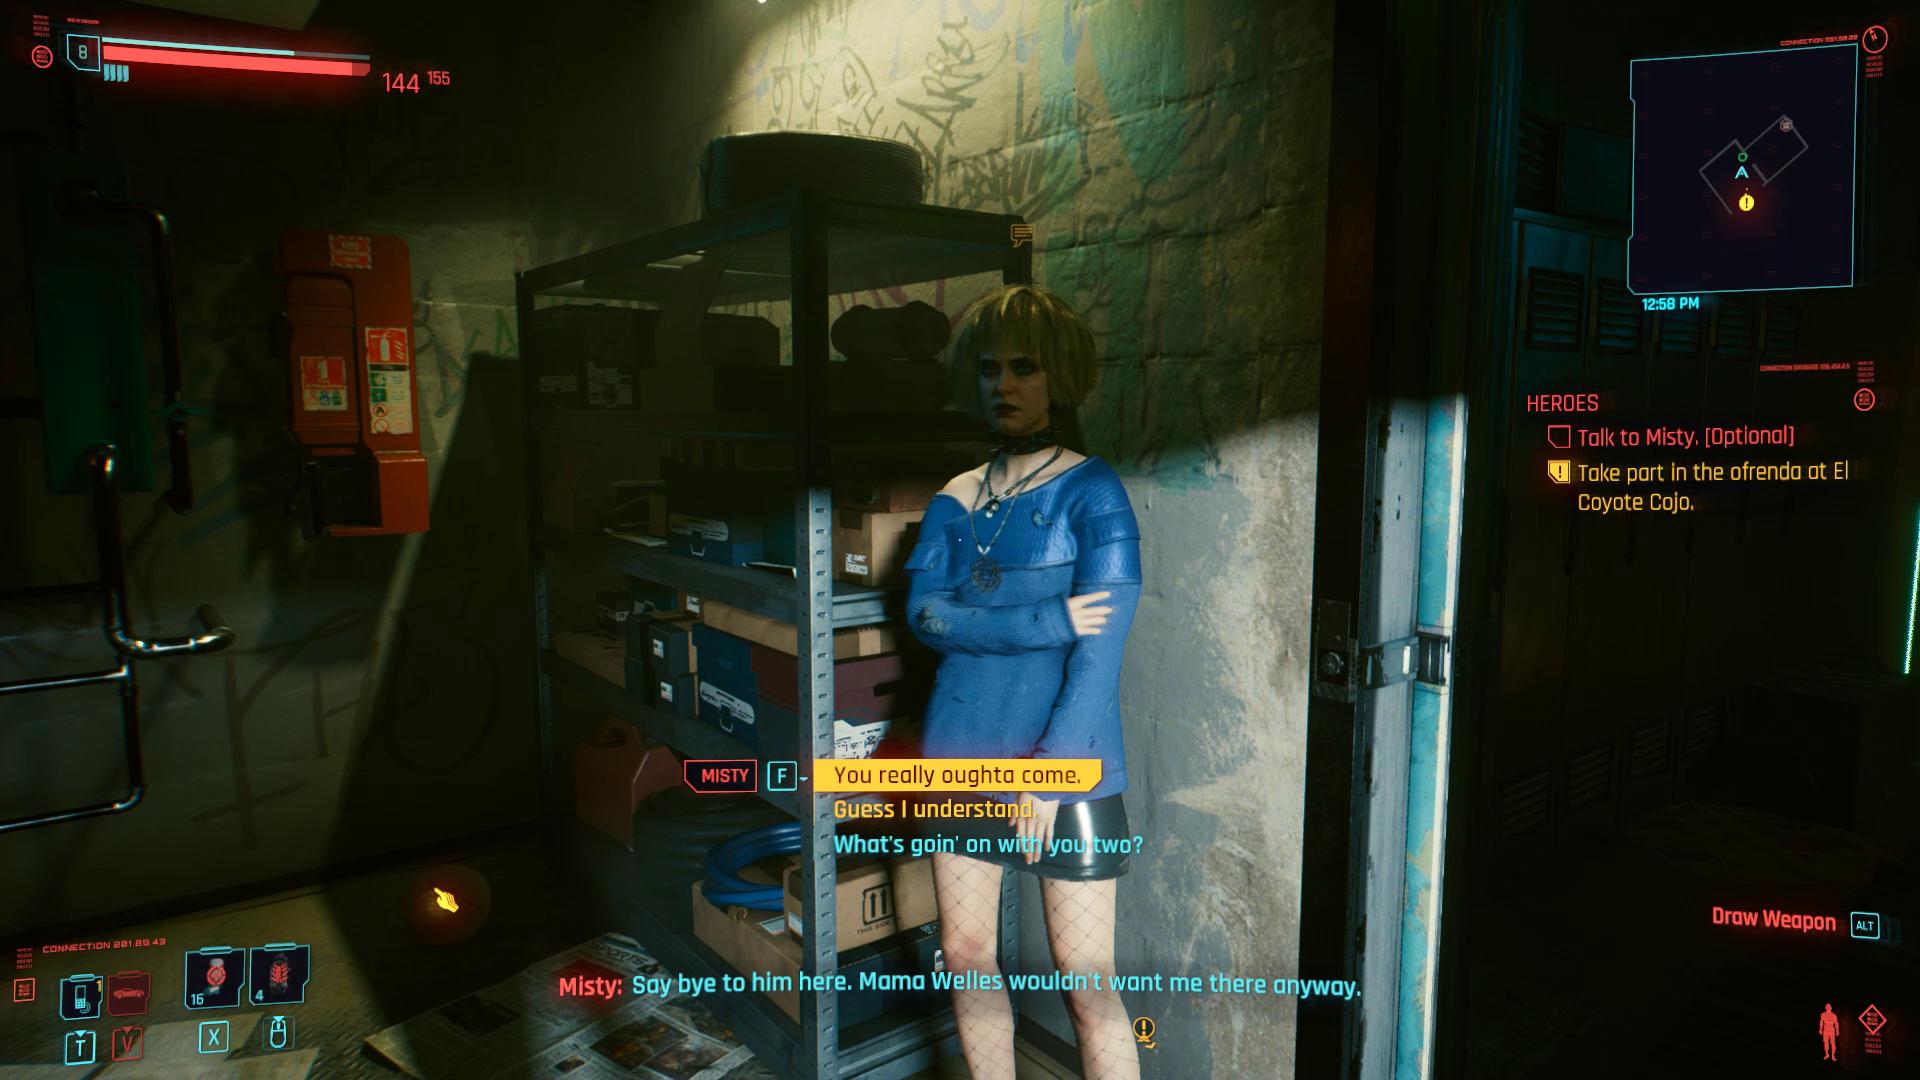 Cyberpunk 2077 Misty